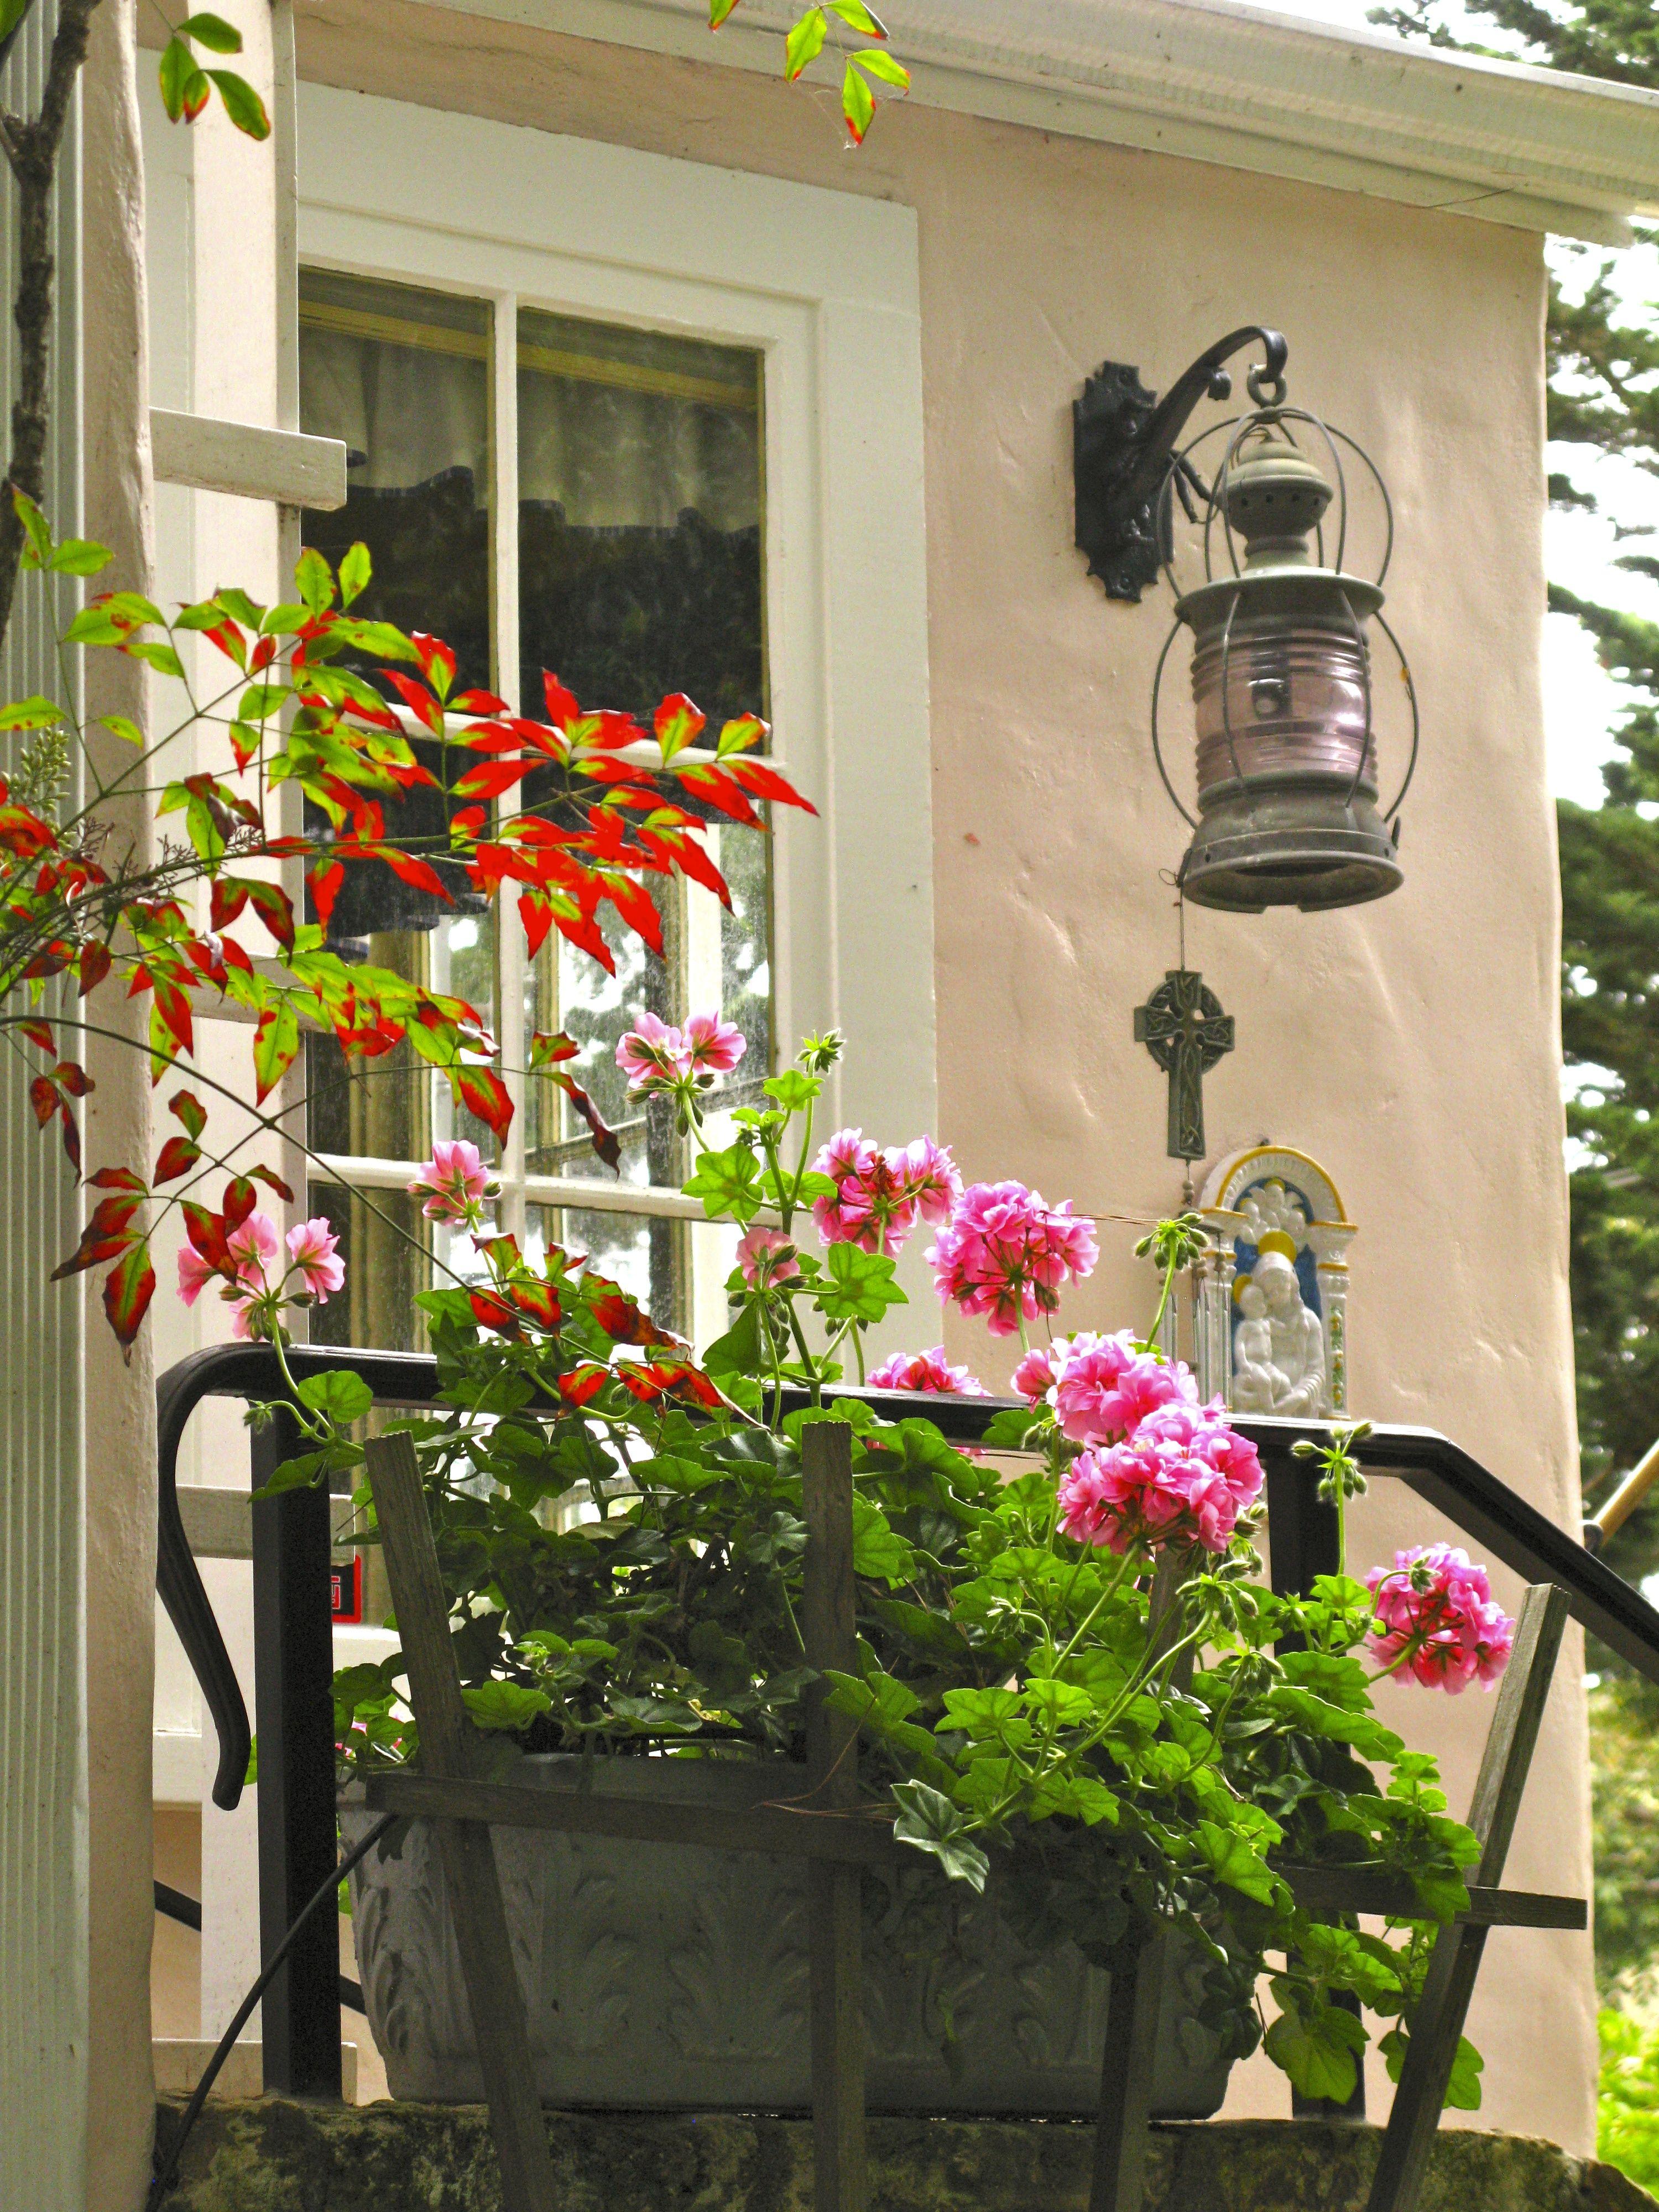 House box window design  carmel  cottages of carmel  pinterest  cottage style walkways